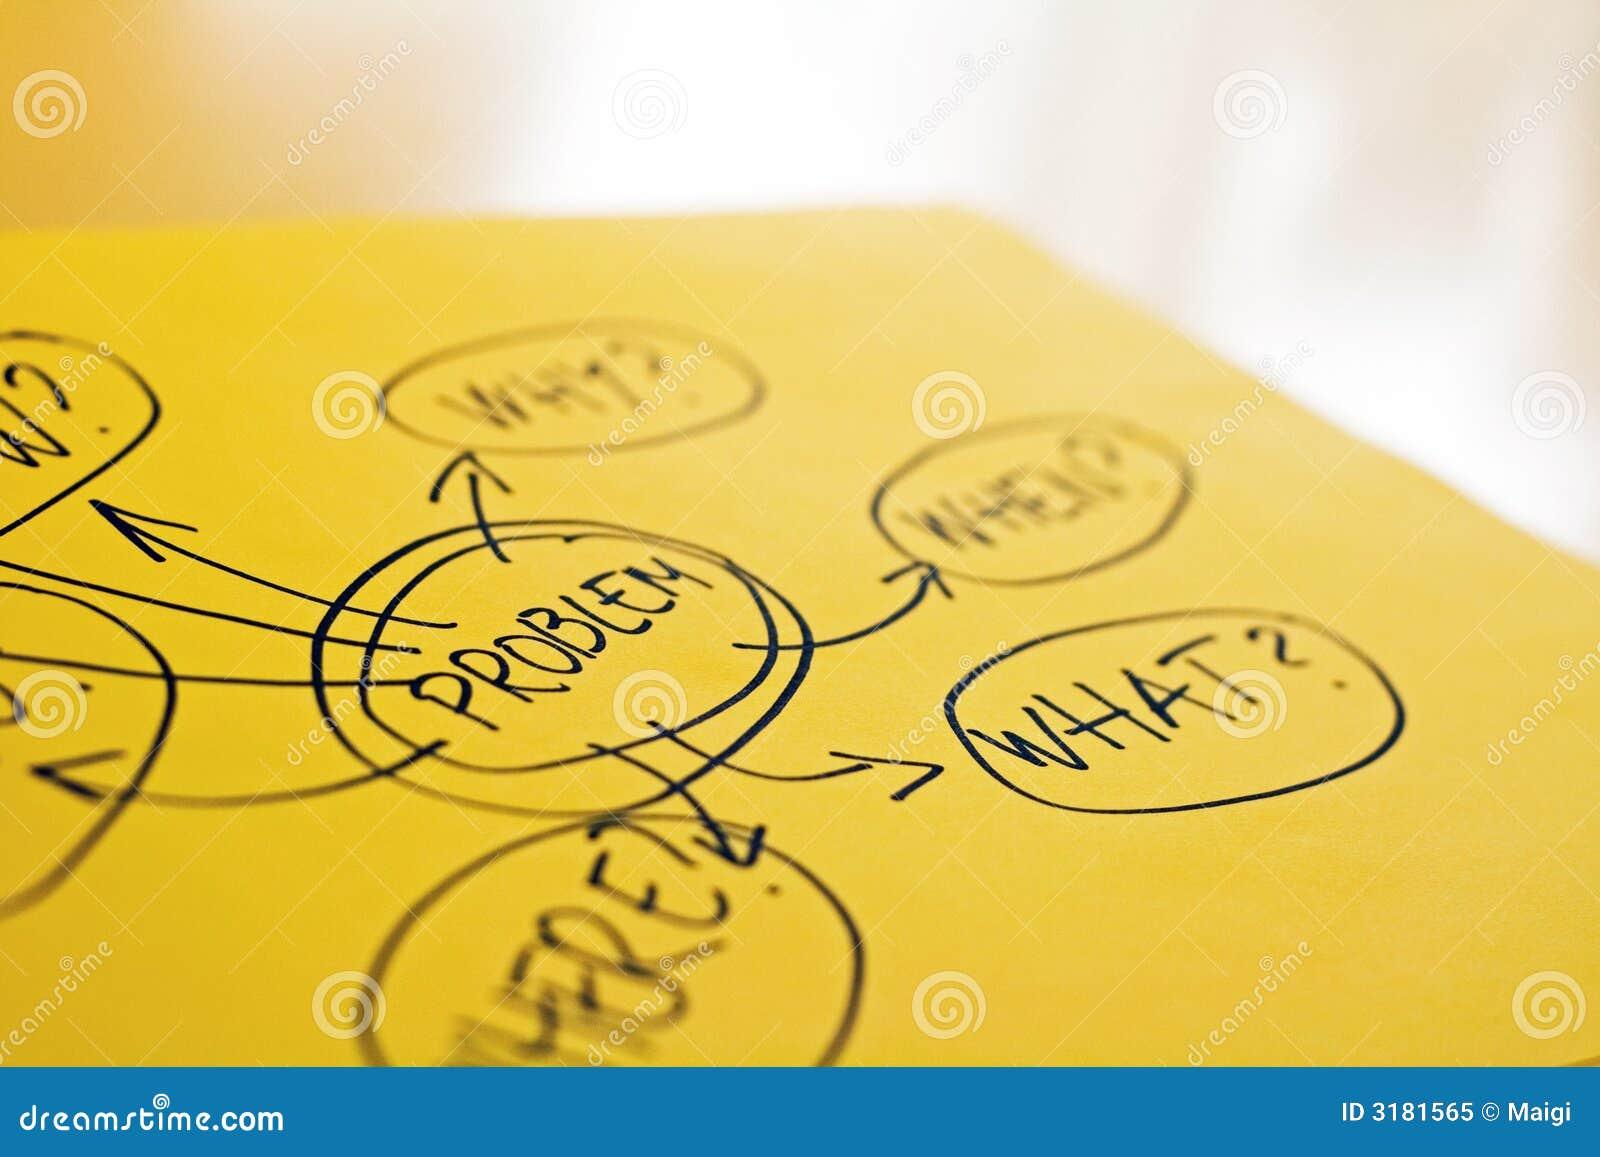 Mind map on the desk